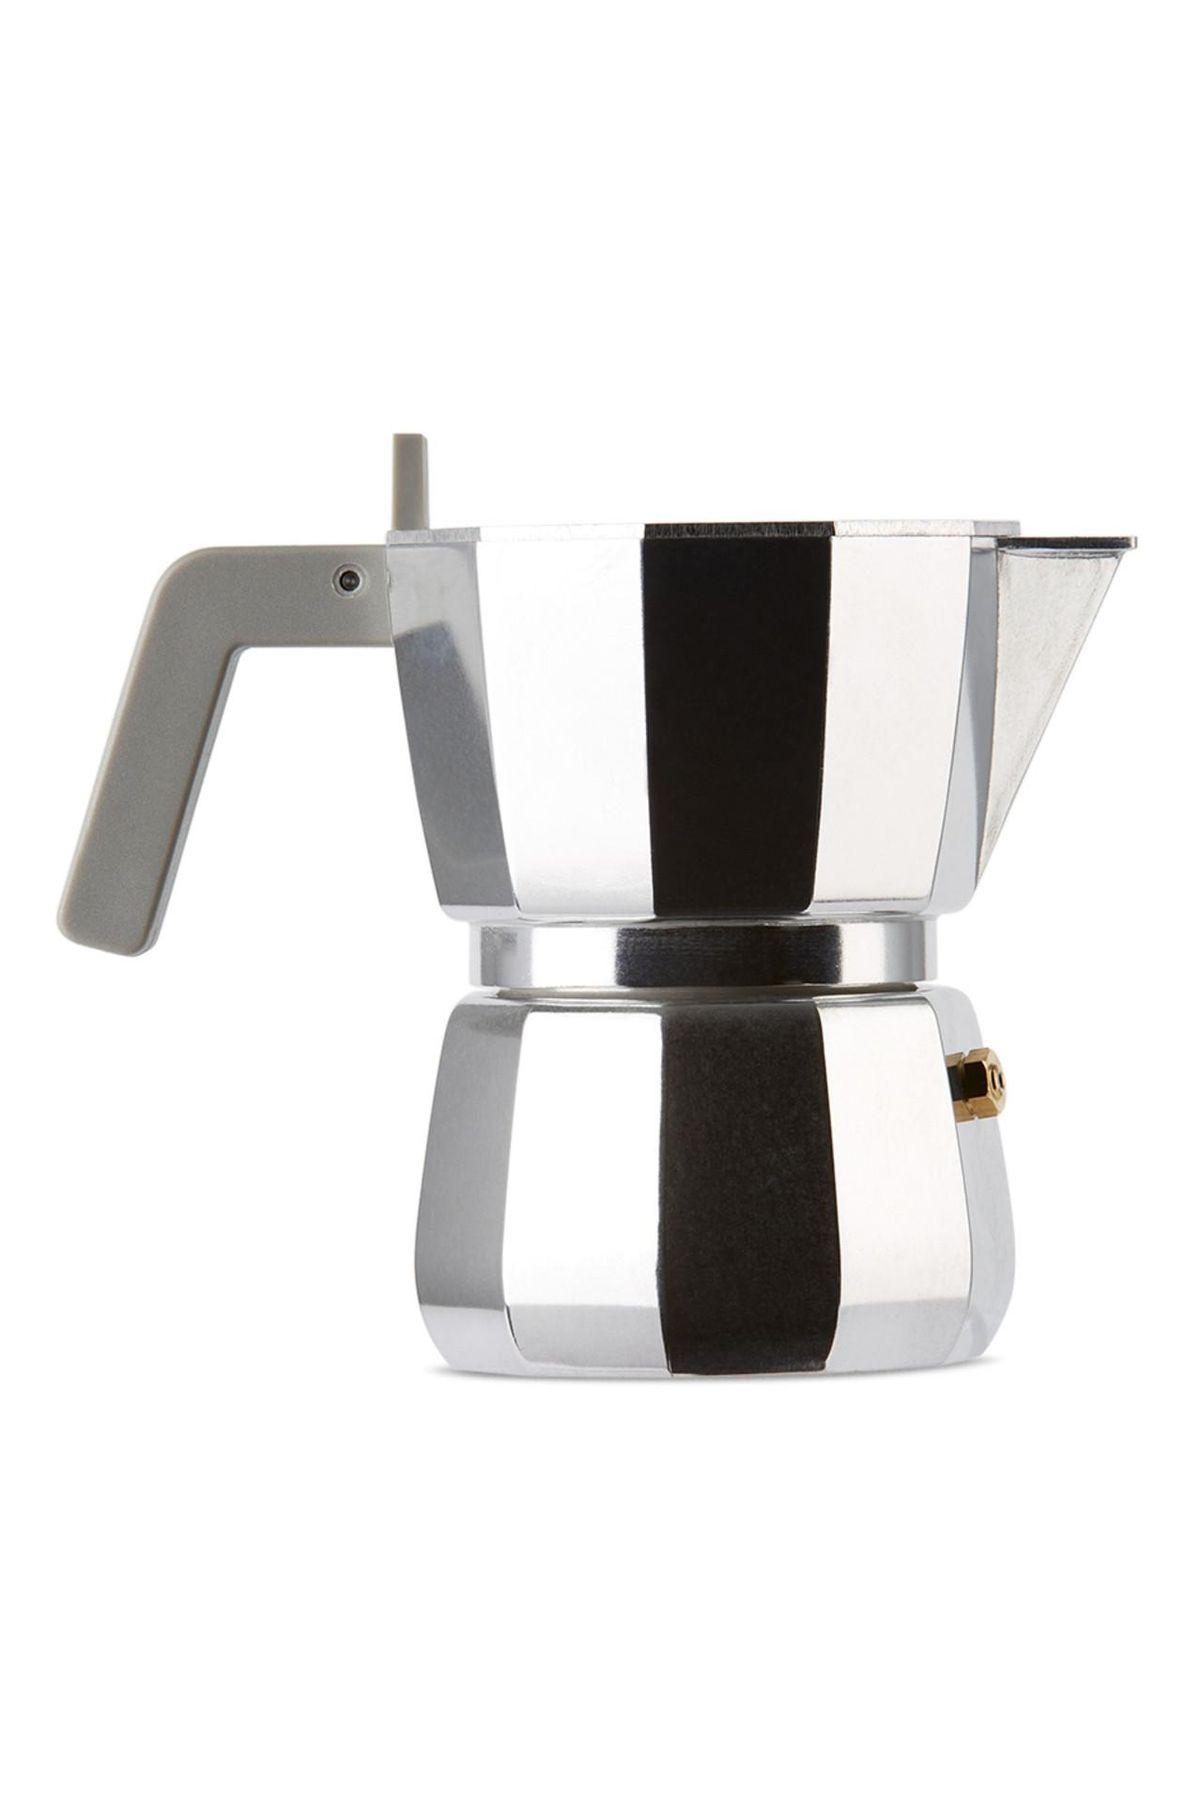 david chipperfield silver alessi edition moka coffee pot